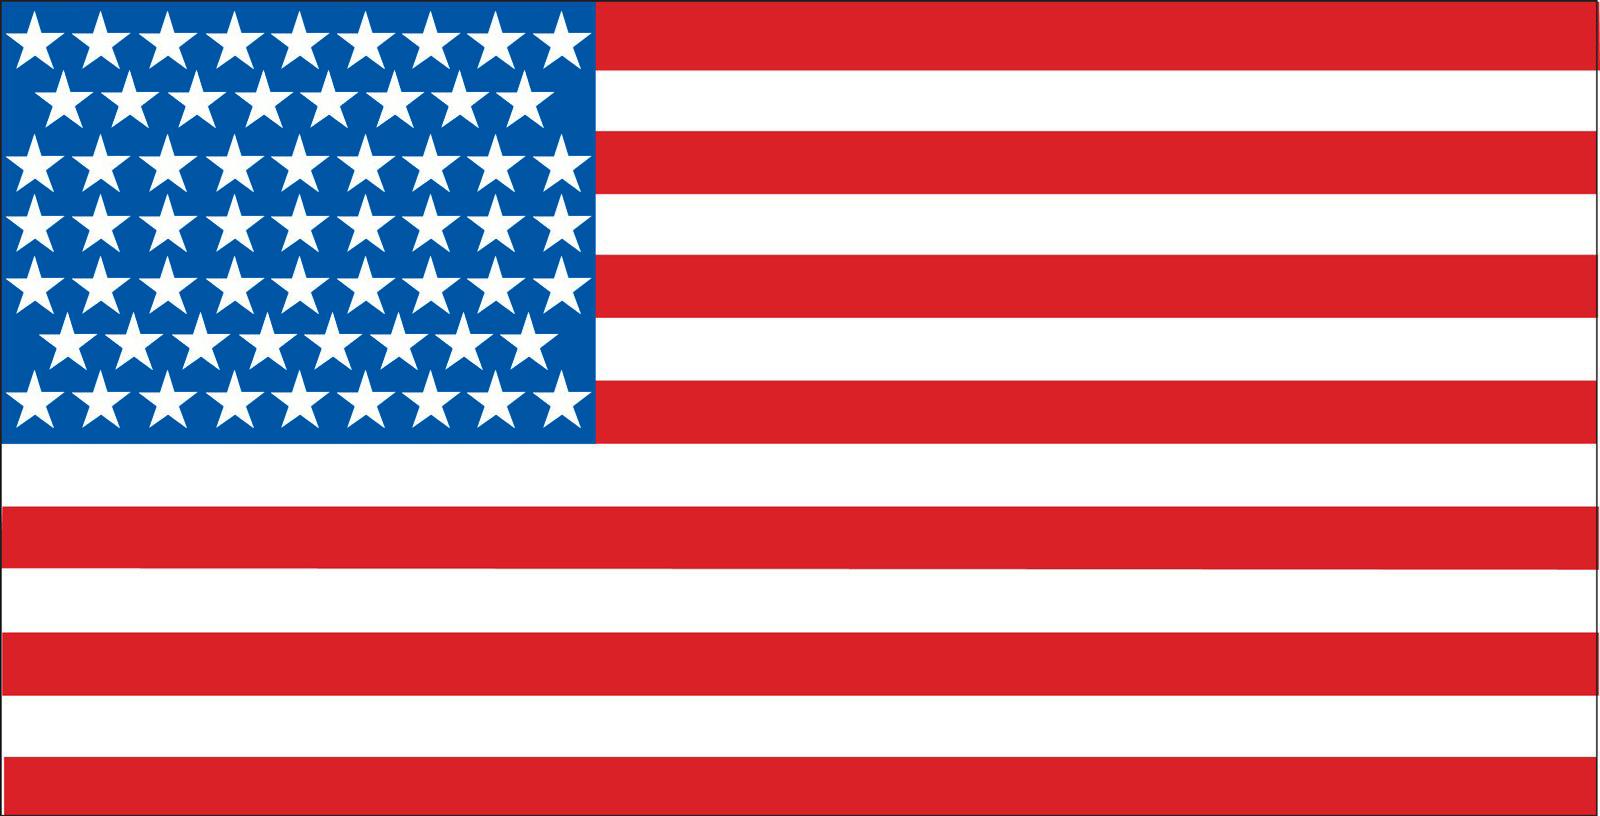 United States American Flag HD Wallpaper 3596 Wallpaper 1600x816